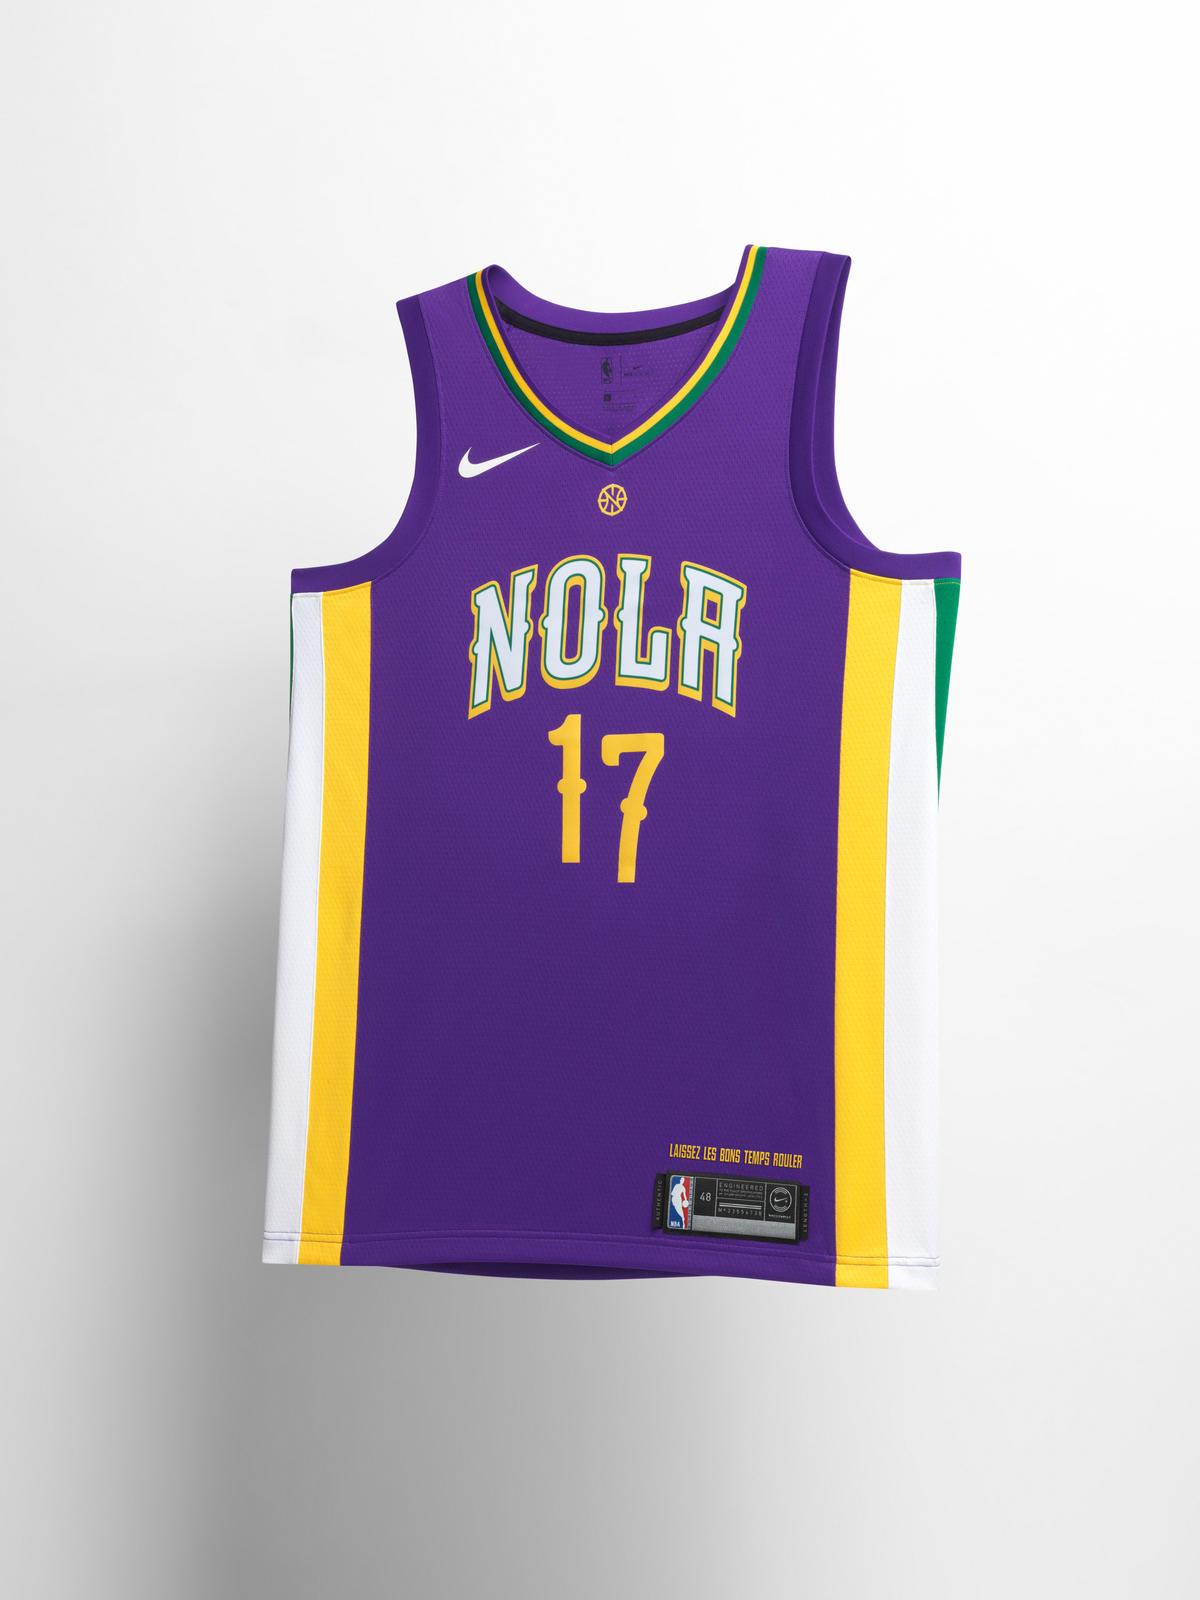 Nike_NBA_City_Edition_Uniform_New_Orleans_Pelicans_0046_native_1600